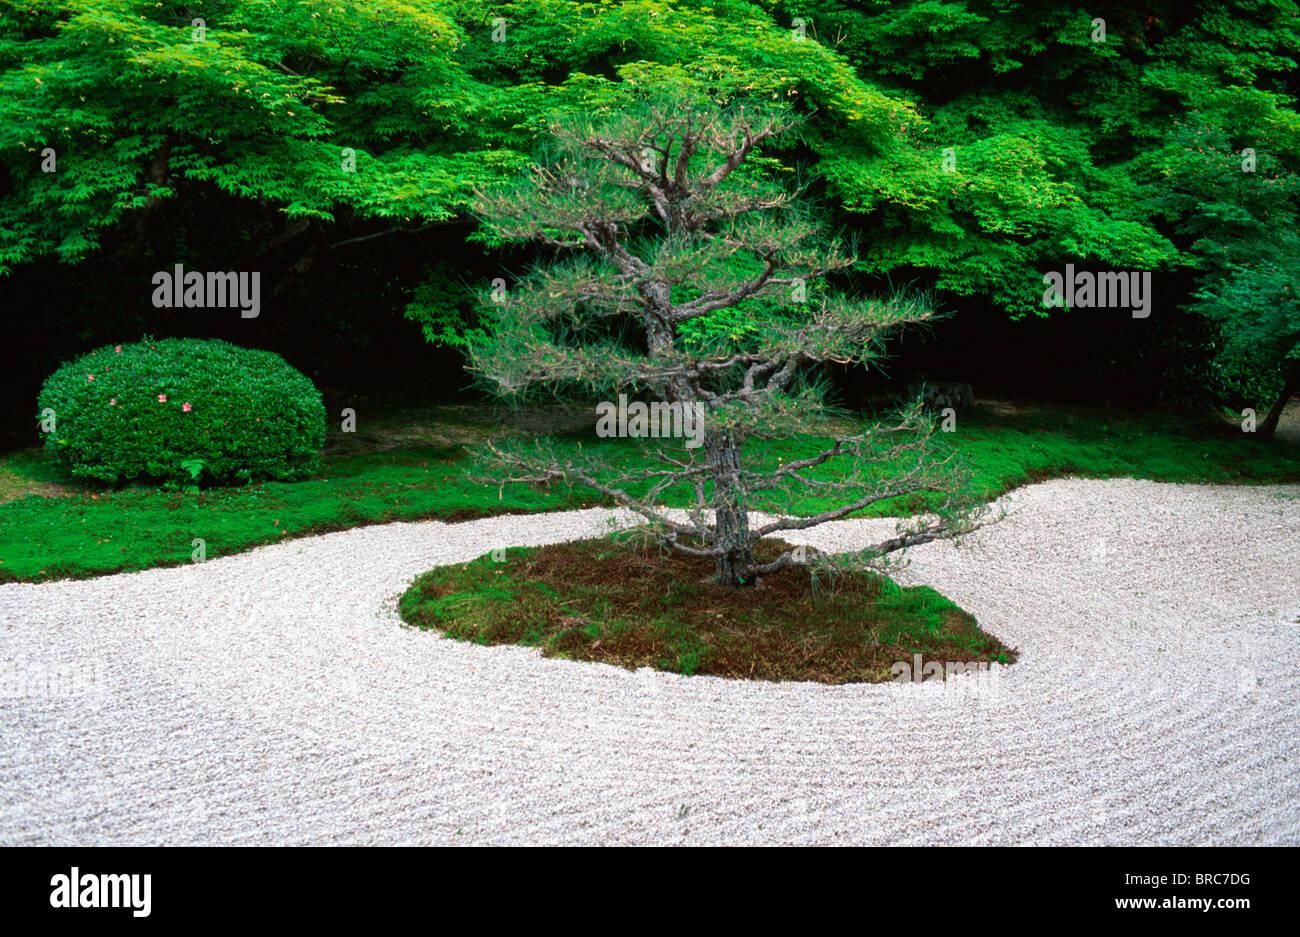 Raked sand in Tenjuan garden, Nanzenji temple, Kyoto Japan. - Stock Image